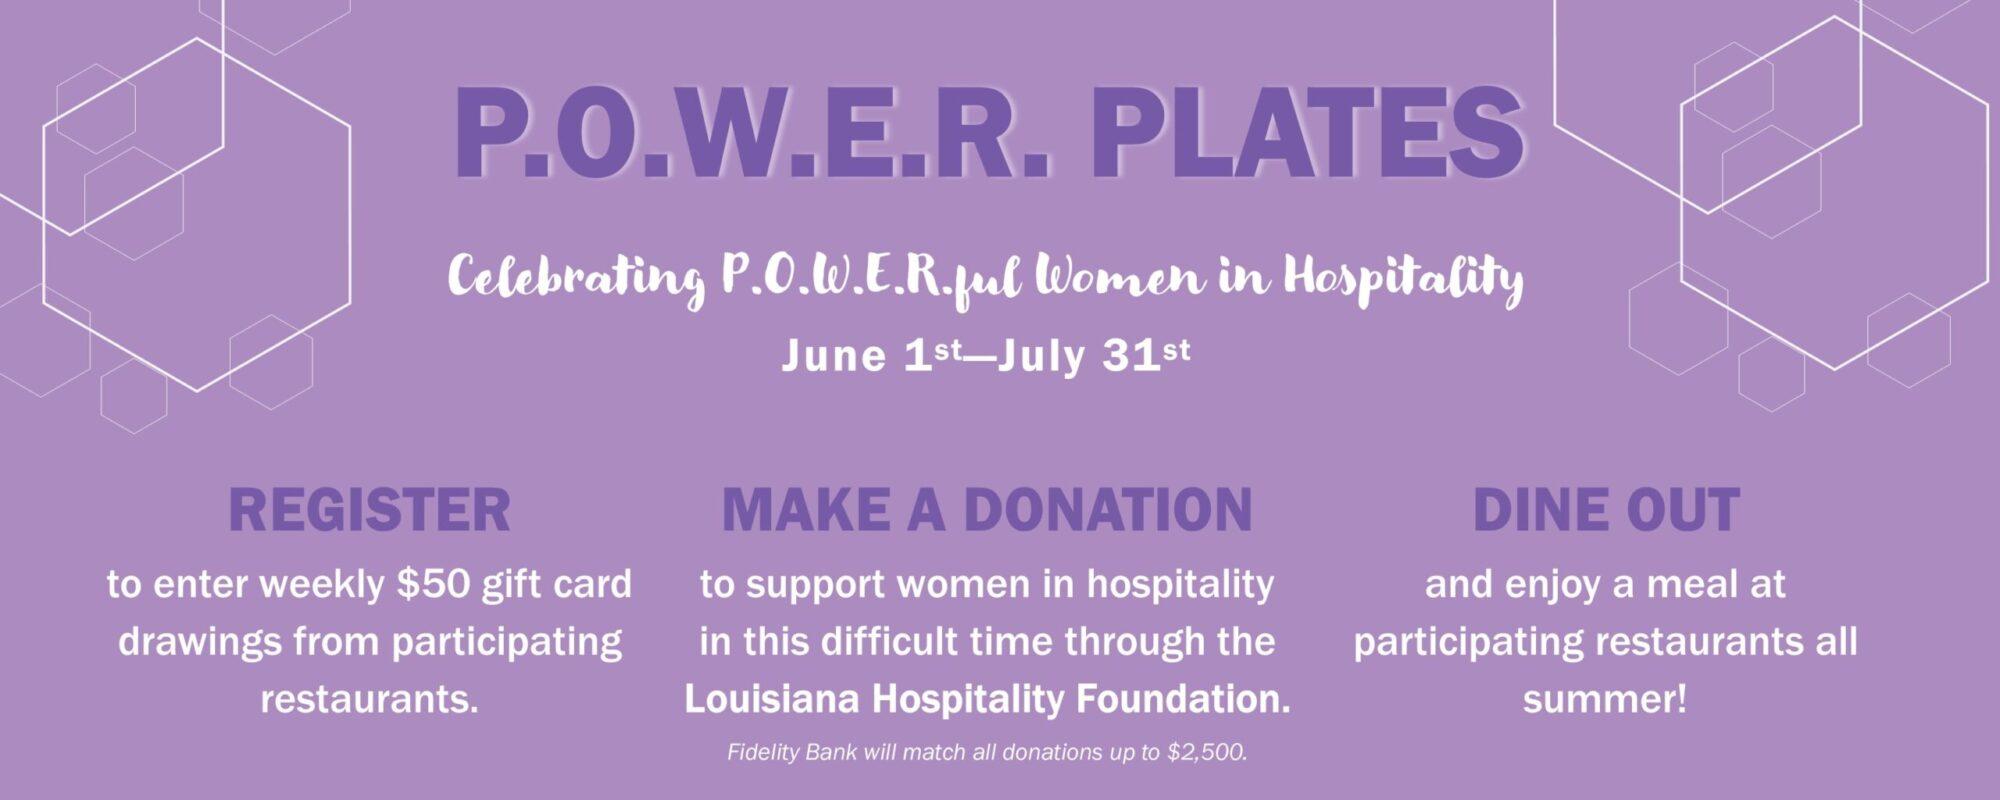 POWER Plates - Banner 2